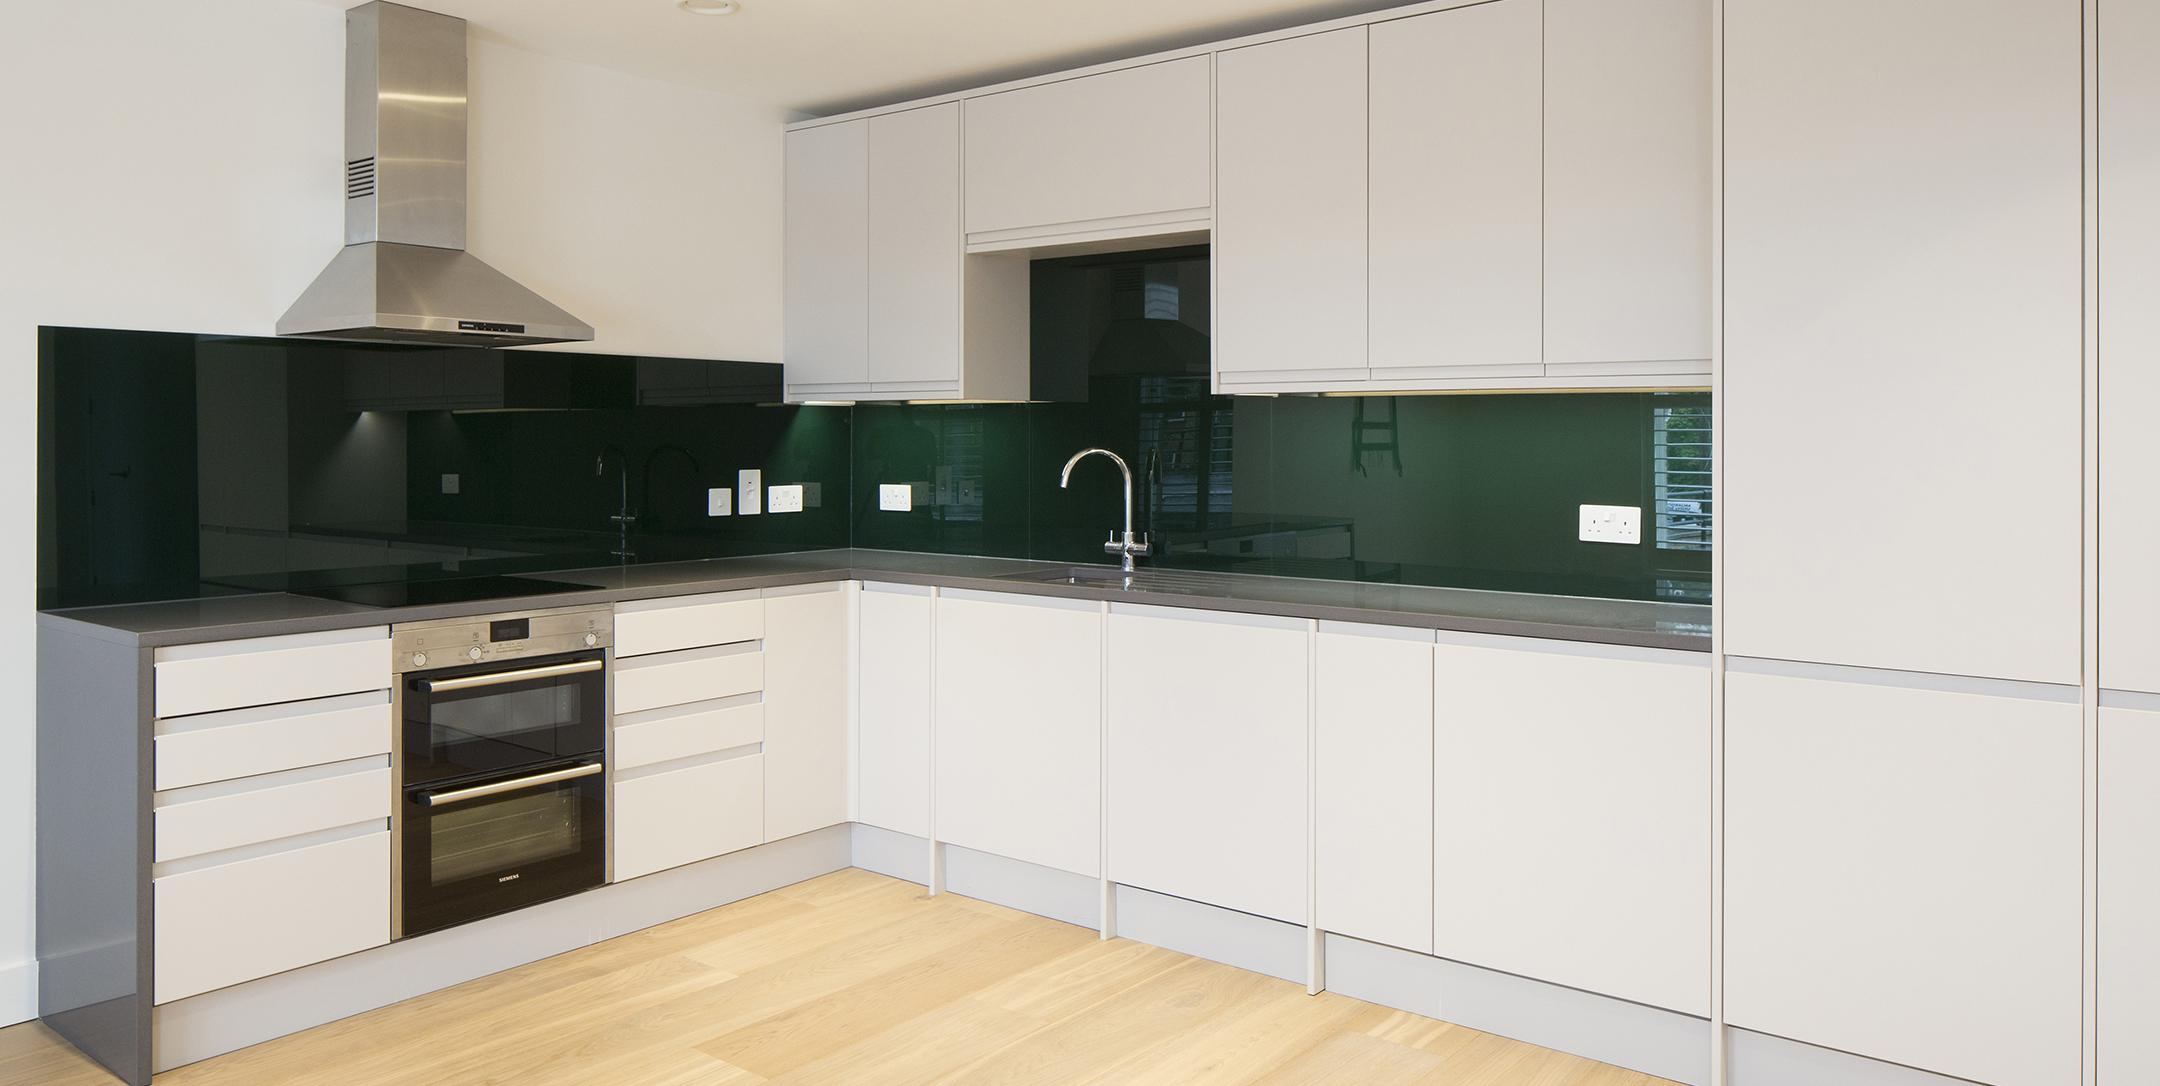 Home Refurbishments Kensington W8 - Ashville Inc